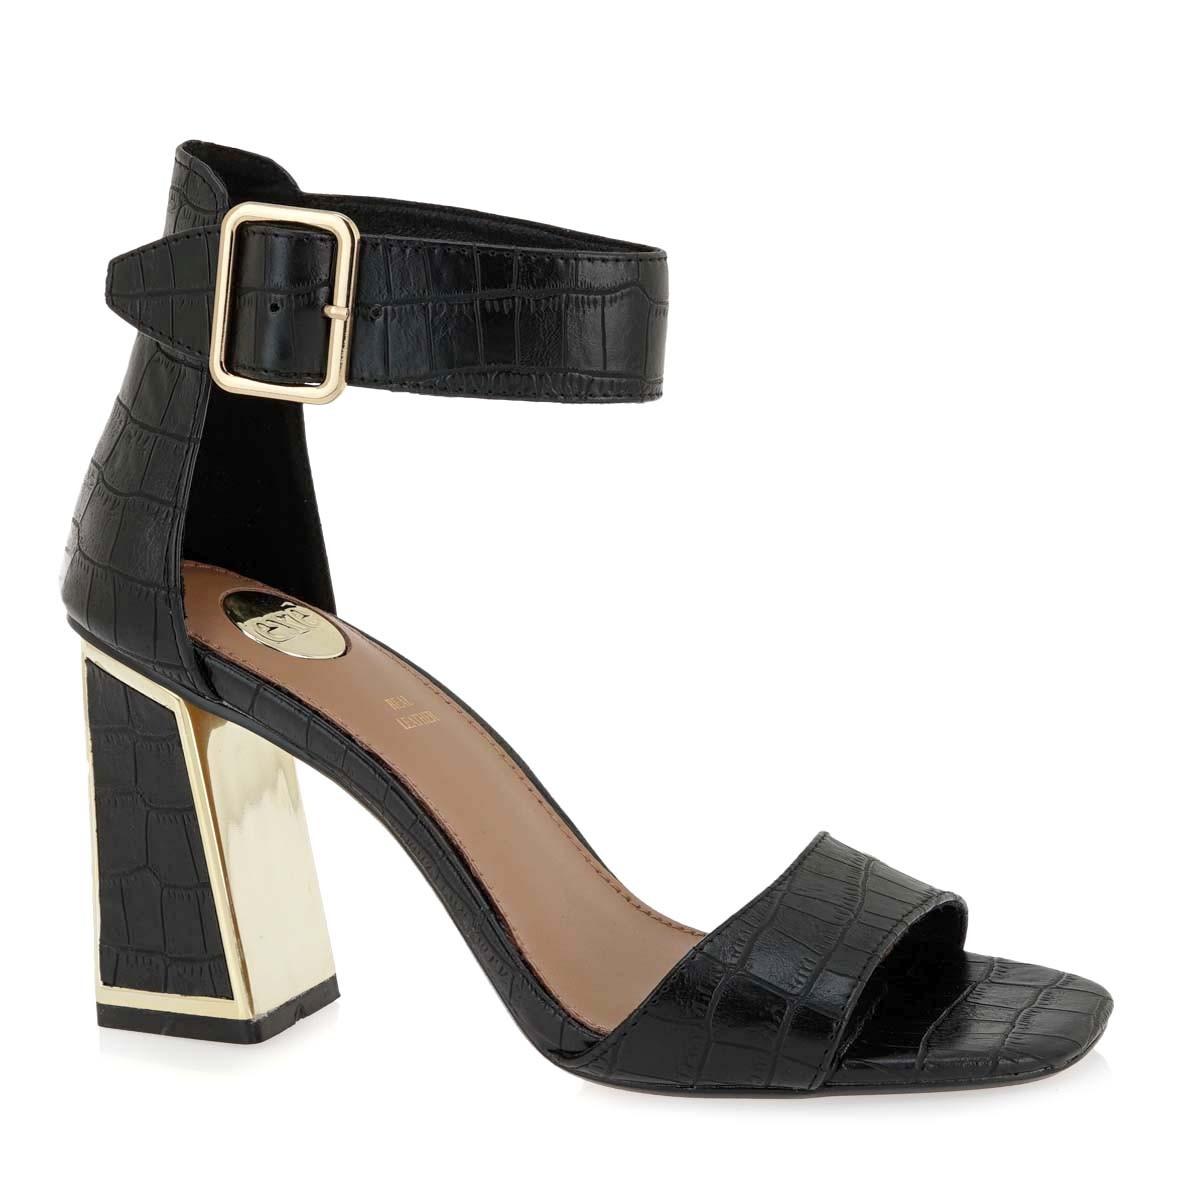 EXE Shoes Πέδιλα Γυναικεία 157-LUCIA-150 Μαύρο Κροκό K47001575024